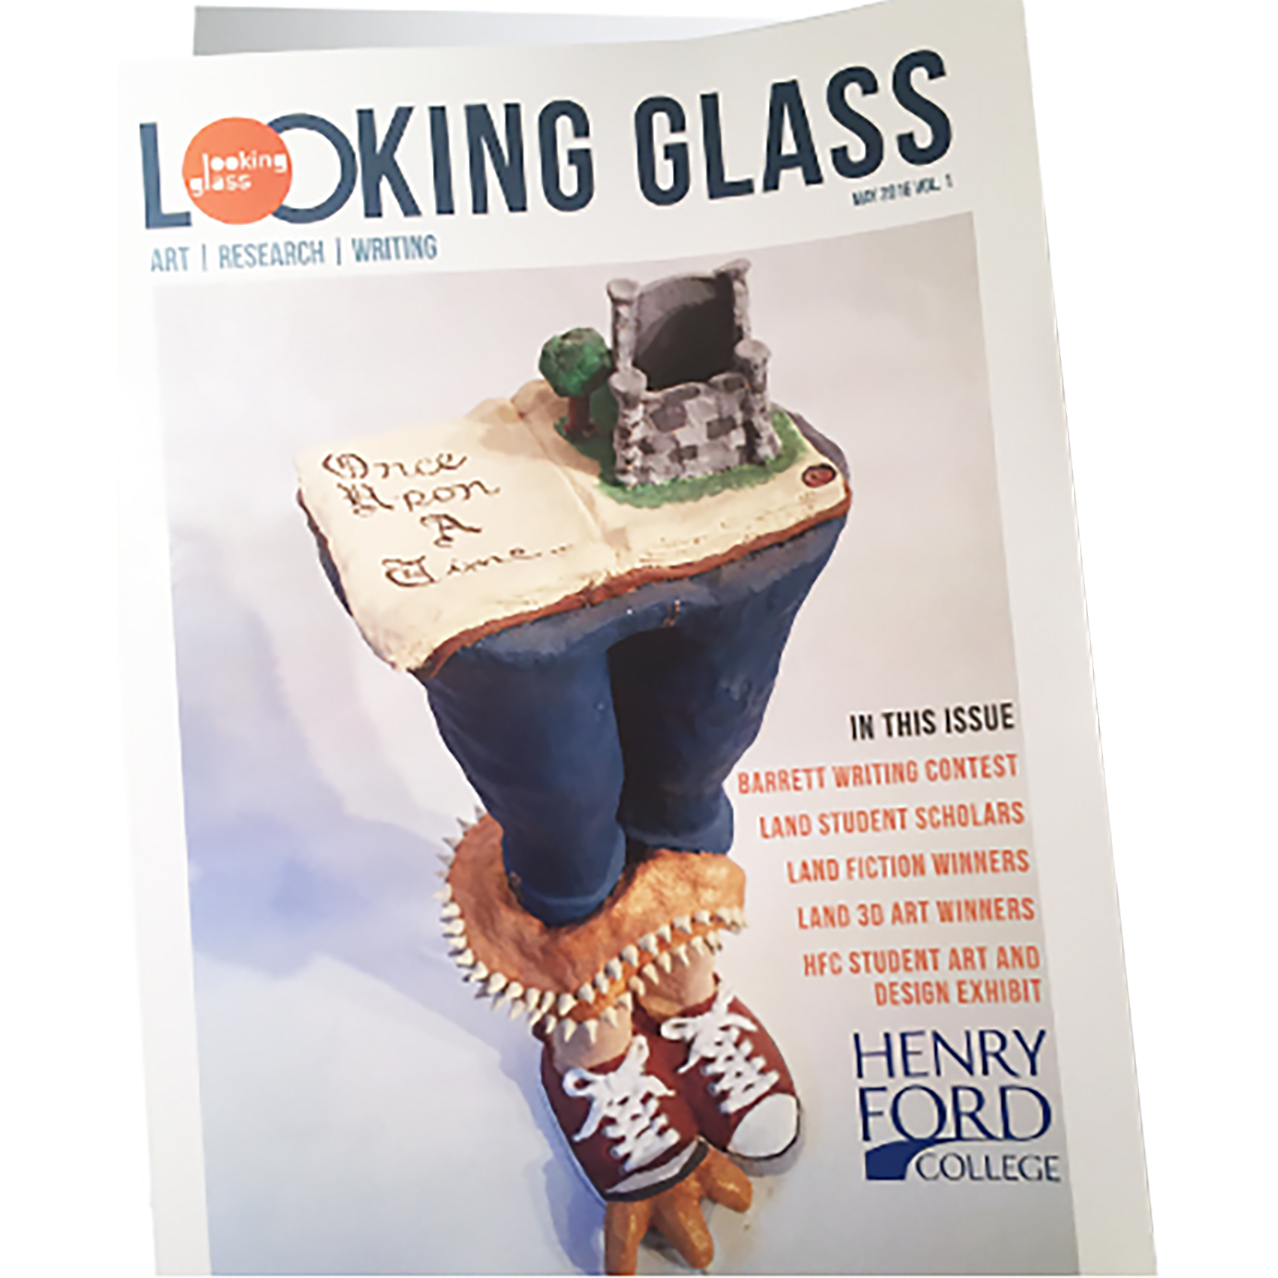 The Looking Glass literary arts magazine.